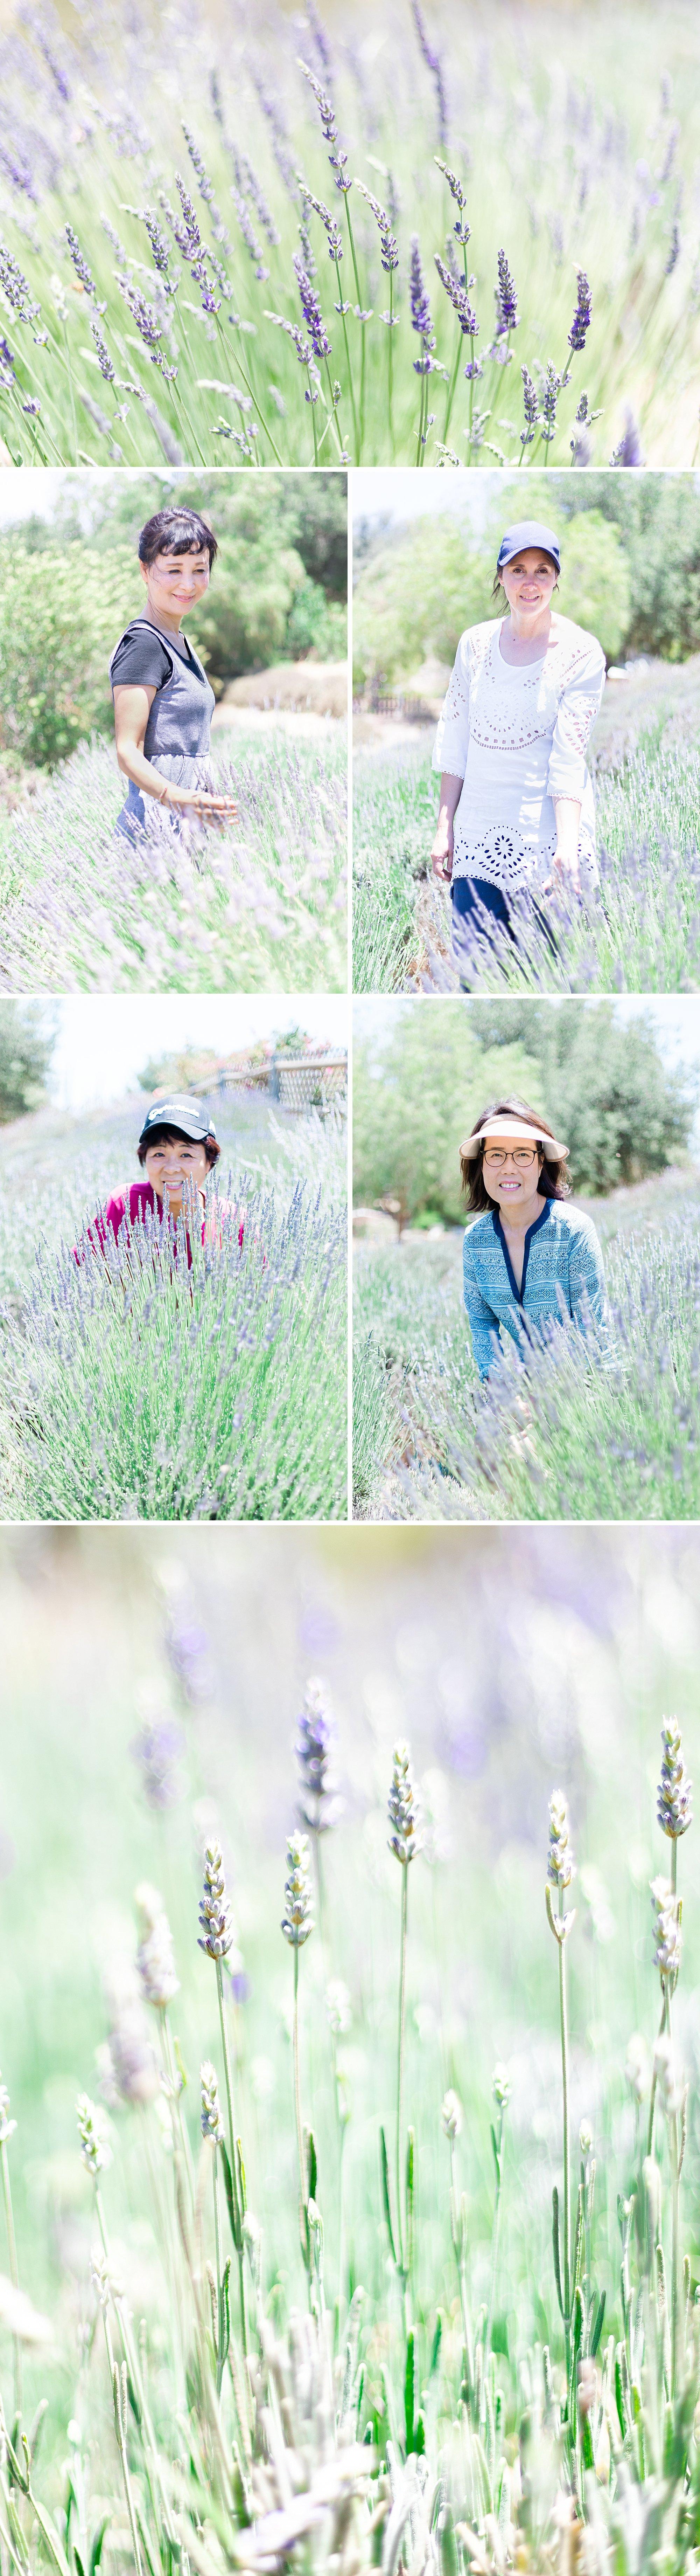 Lavender_Farm_Post_0011.jpg